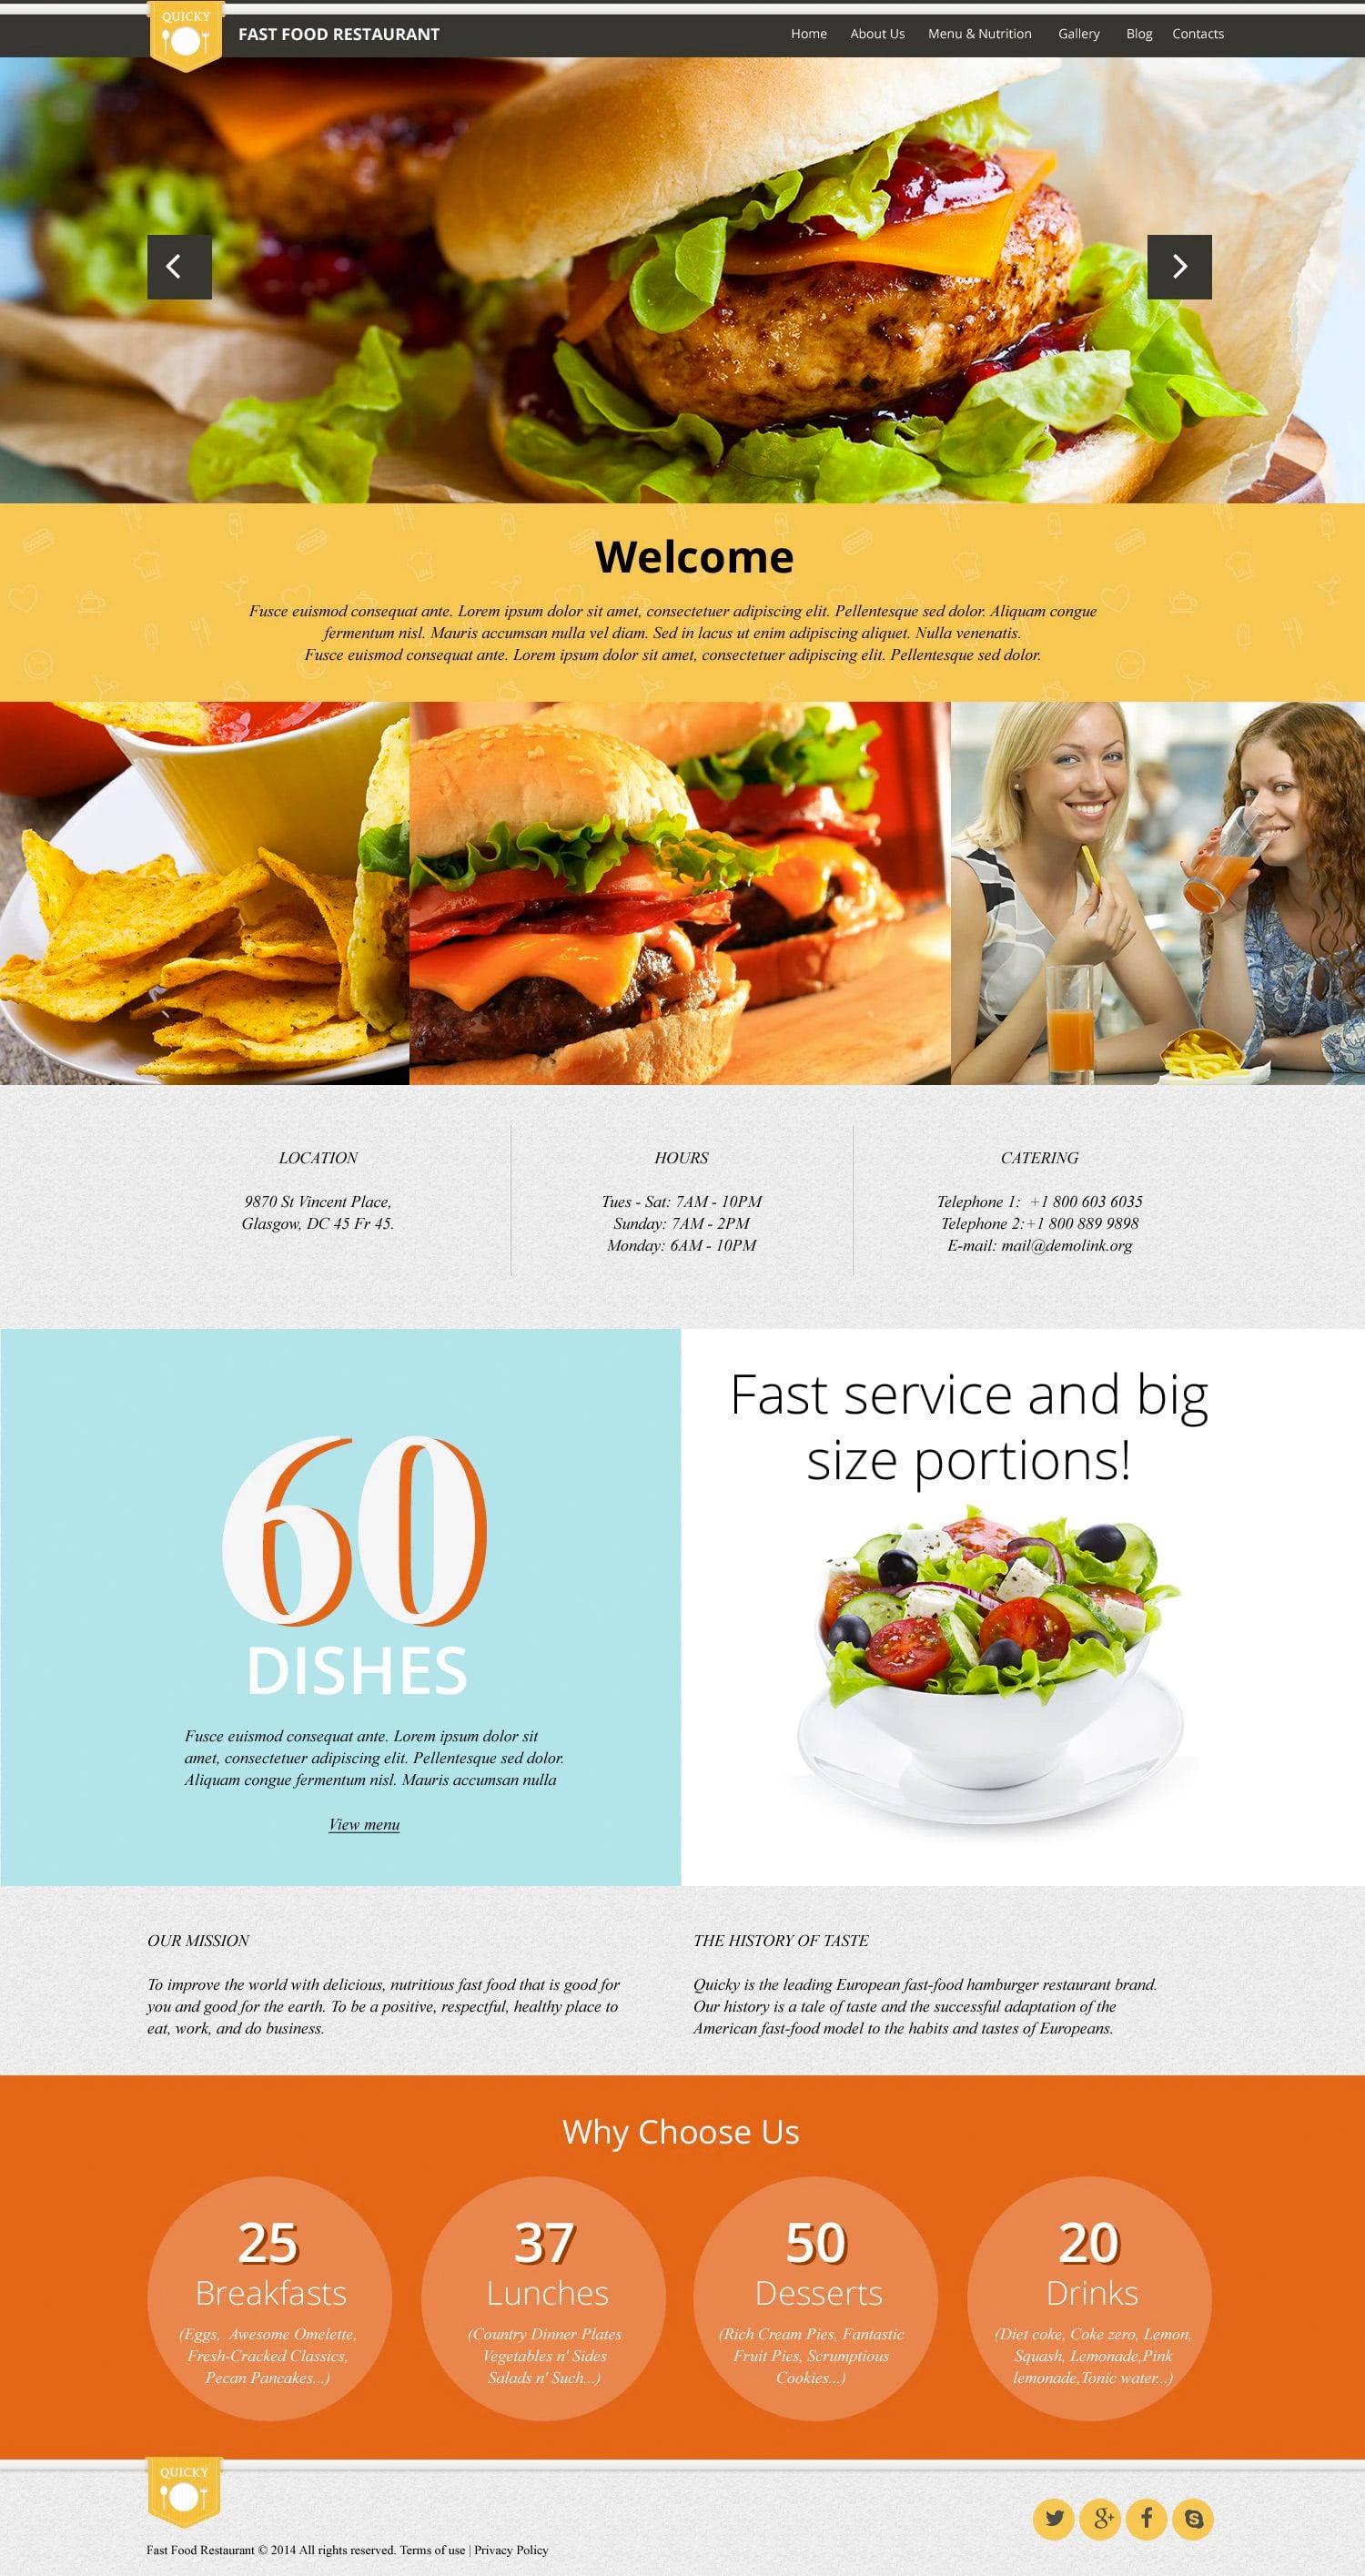 WordPress Food Blog Themes - 10 Premium WP Templates - Untitled 4